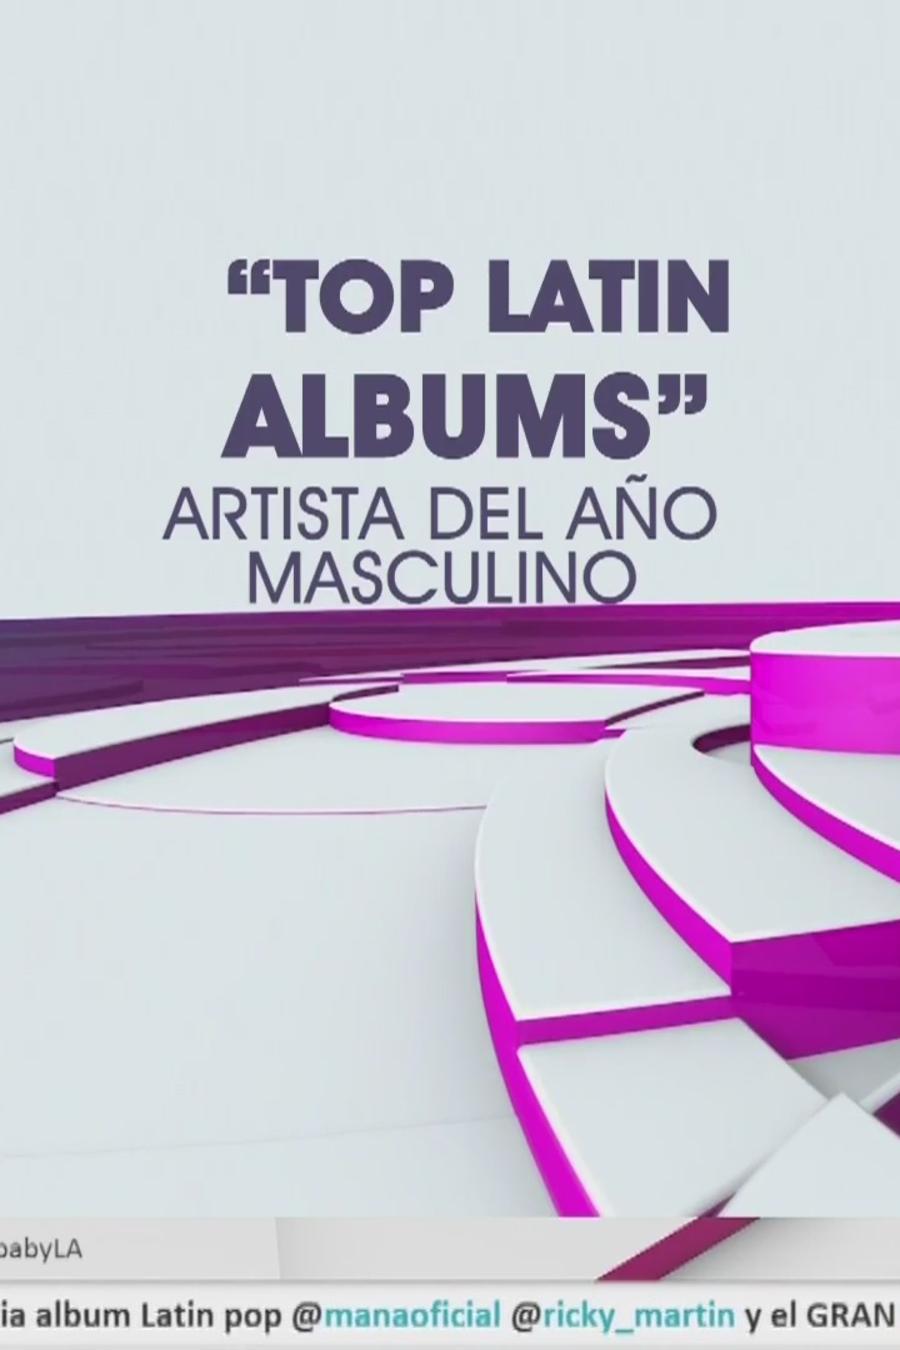 Top Latin Albums, Artista del Año Masculino